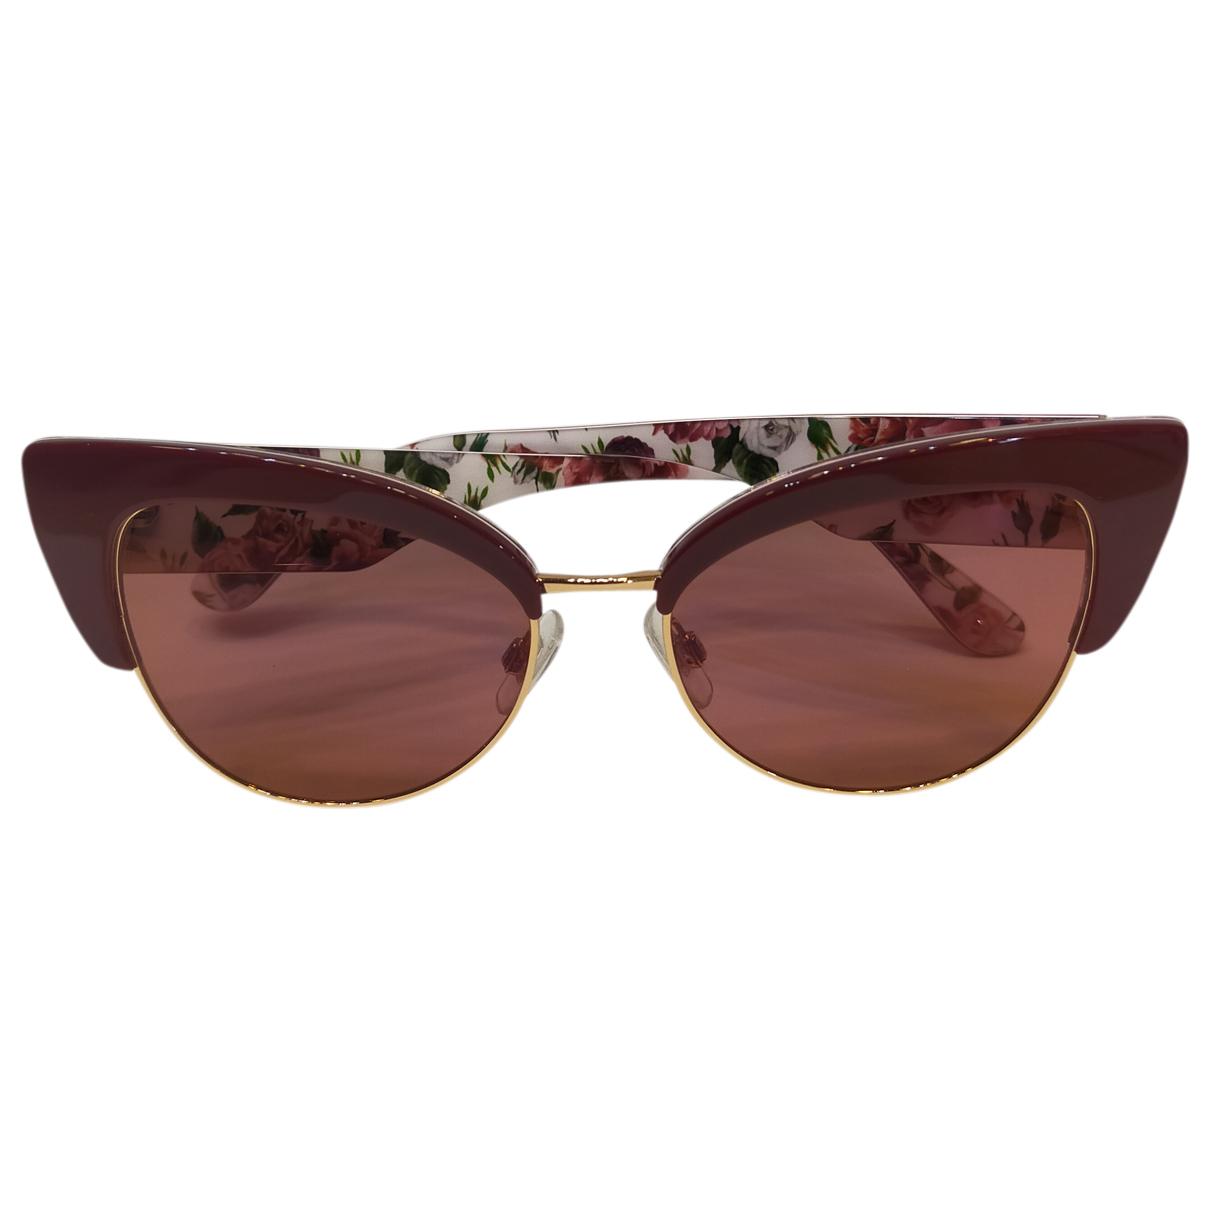 Dolce & Gabbana N Burgundy Sunglasses for Women N